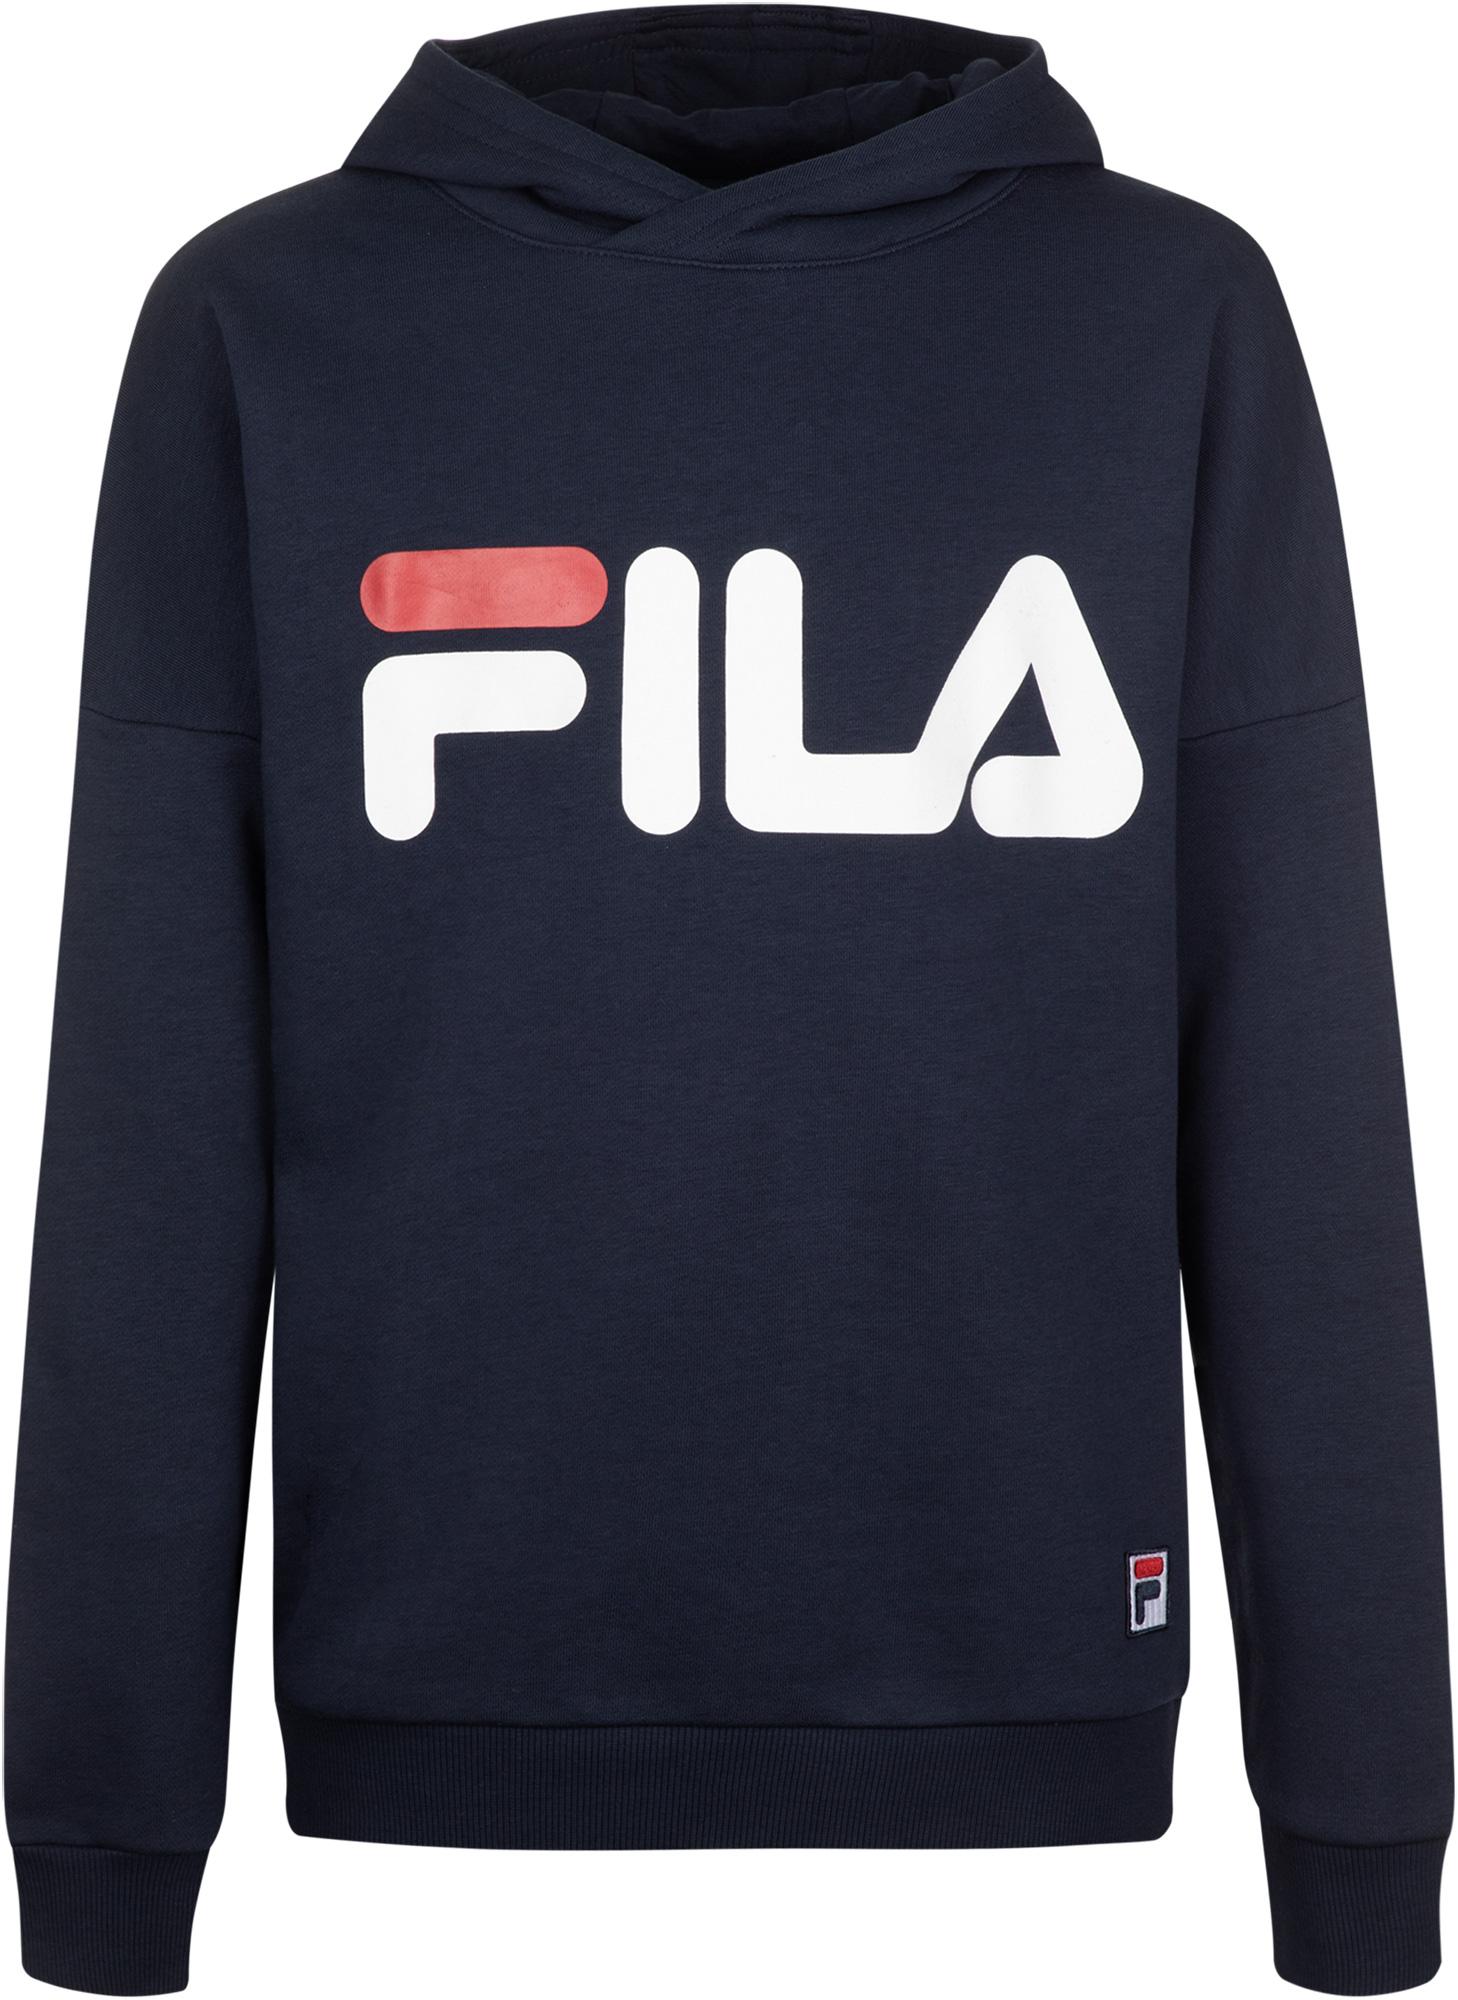 fila худи для мальчиков fila размер 176 Fila Худи для мальчиков Fila, размер 128